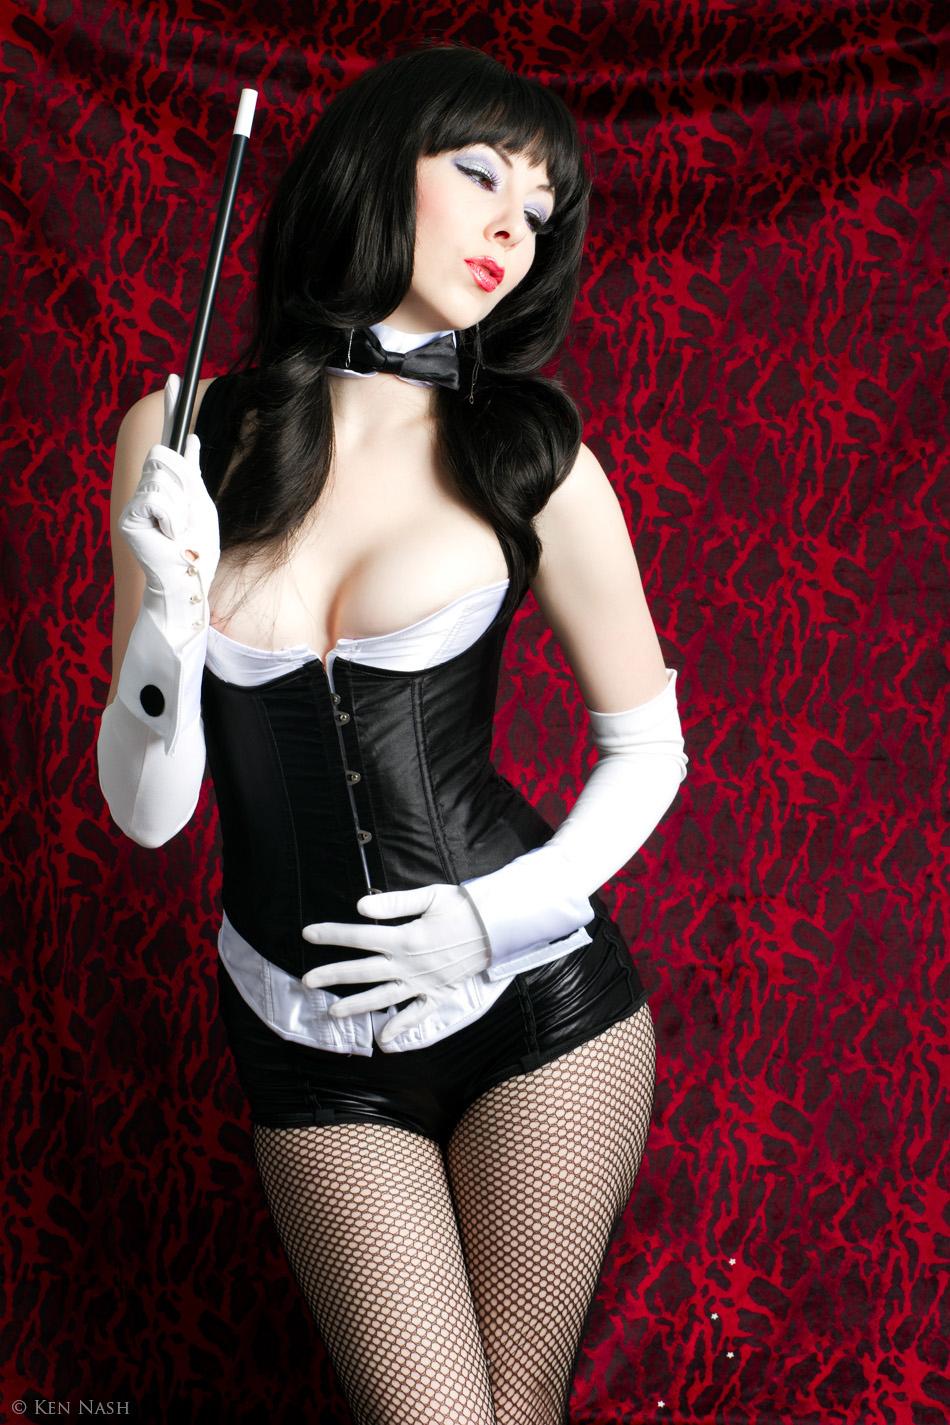 zatanna cosplay by iamlizbit-d4l4xd8 jpgZatanna Cosplay